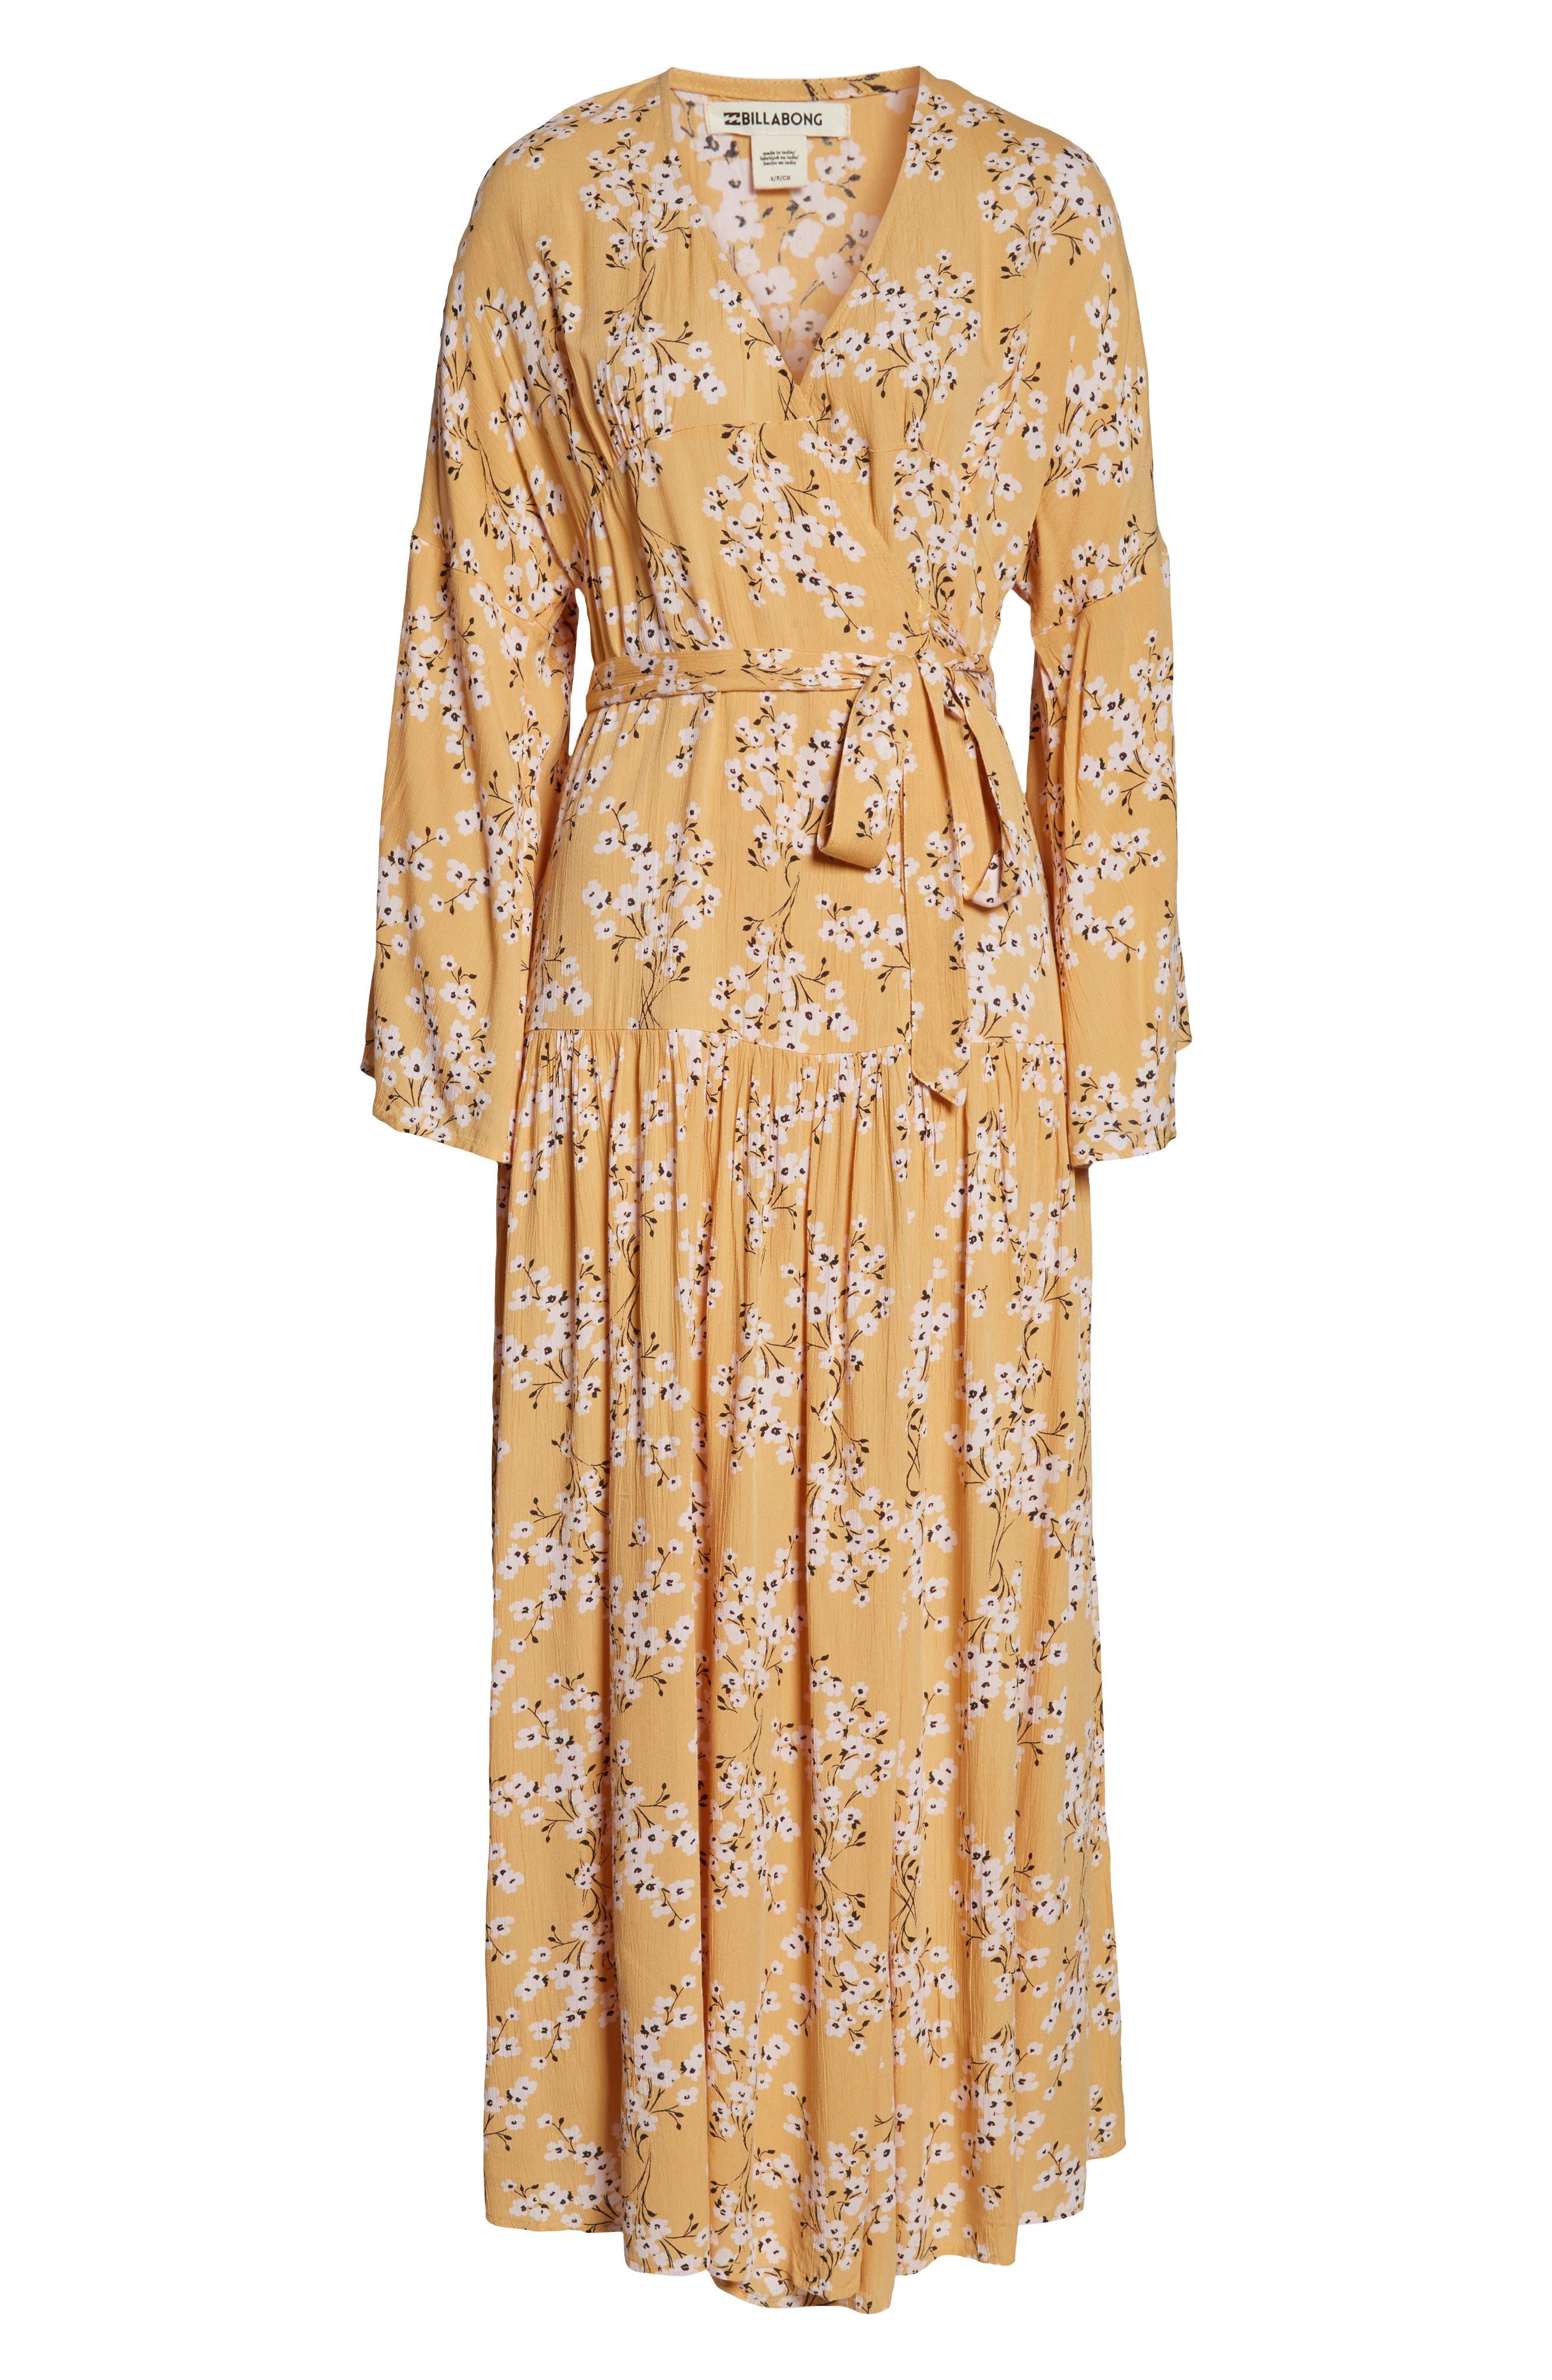 BILLABONG, My Favorite Maxi Dress, Alternate thumbnail 4, color, GOLDEN HOUR